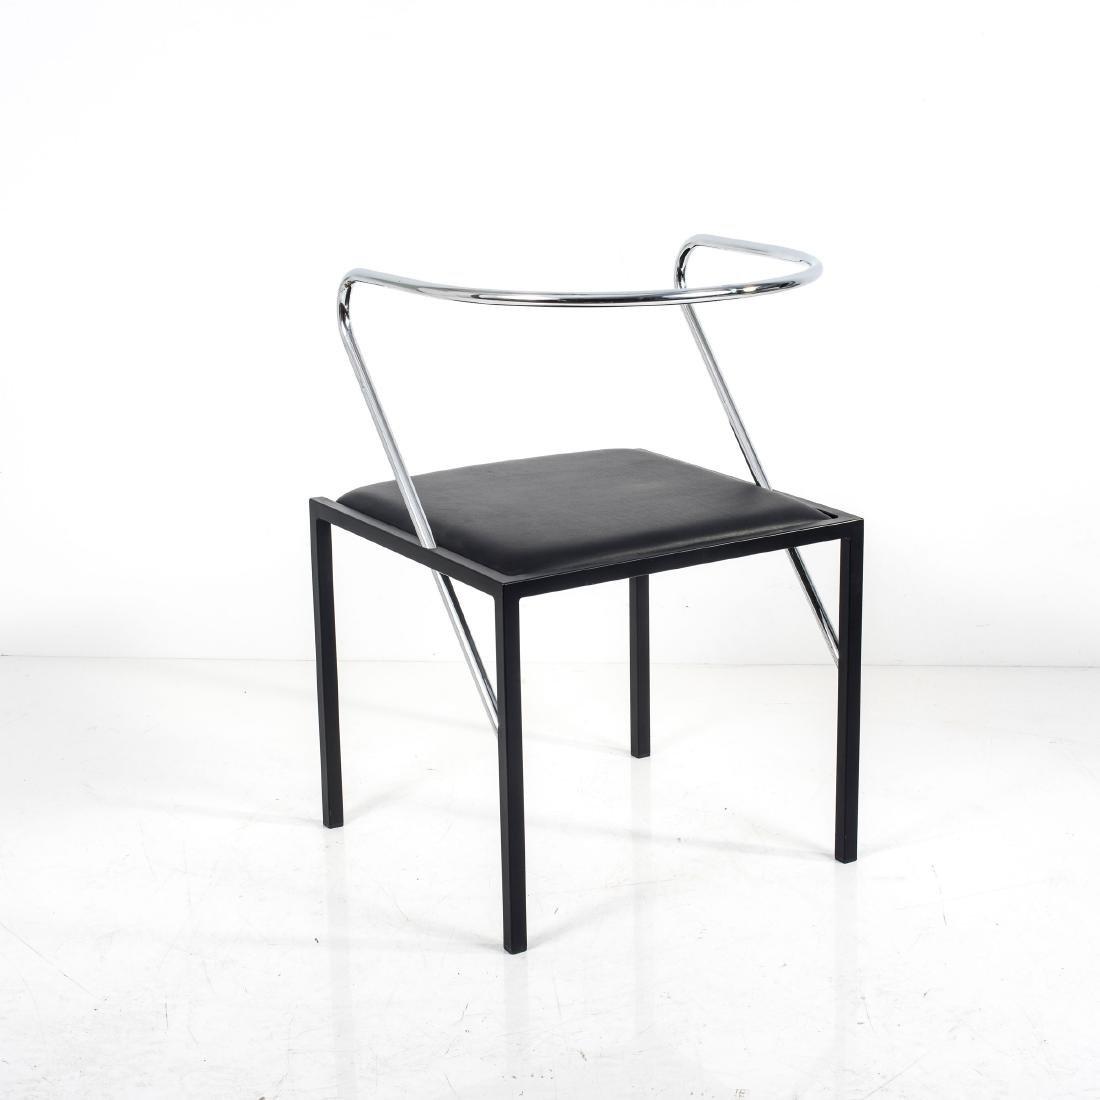 'Apple Honey chair', 1985 - 4